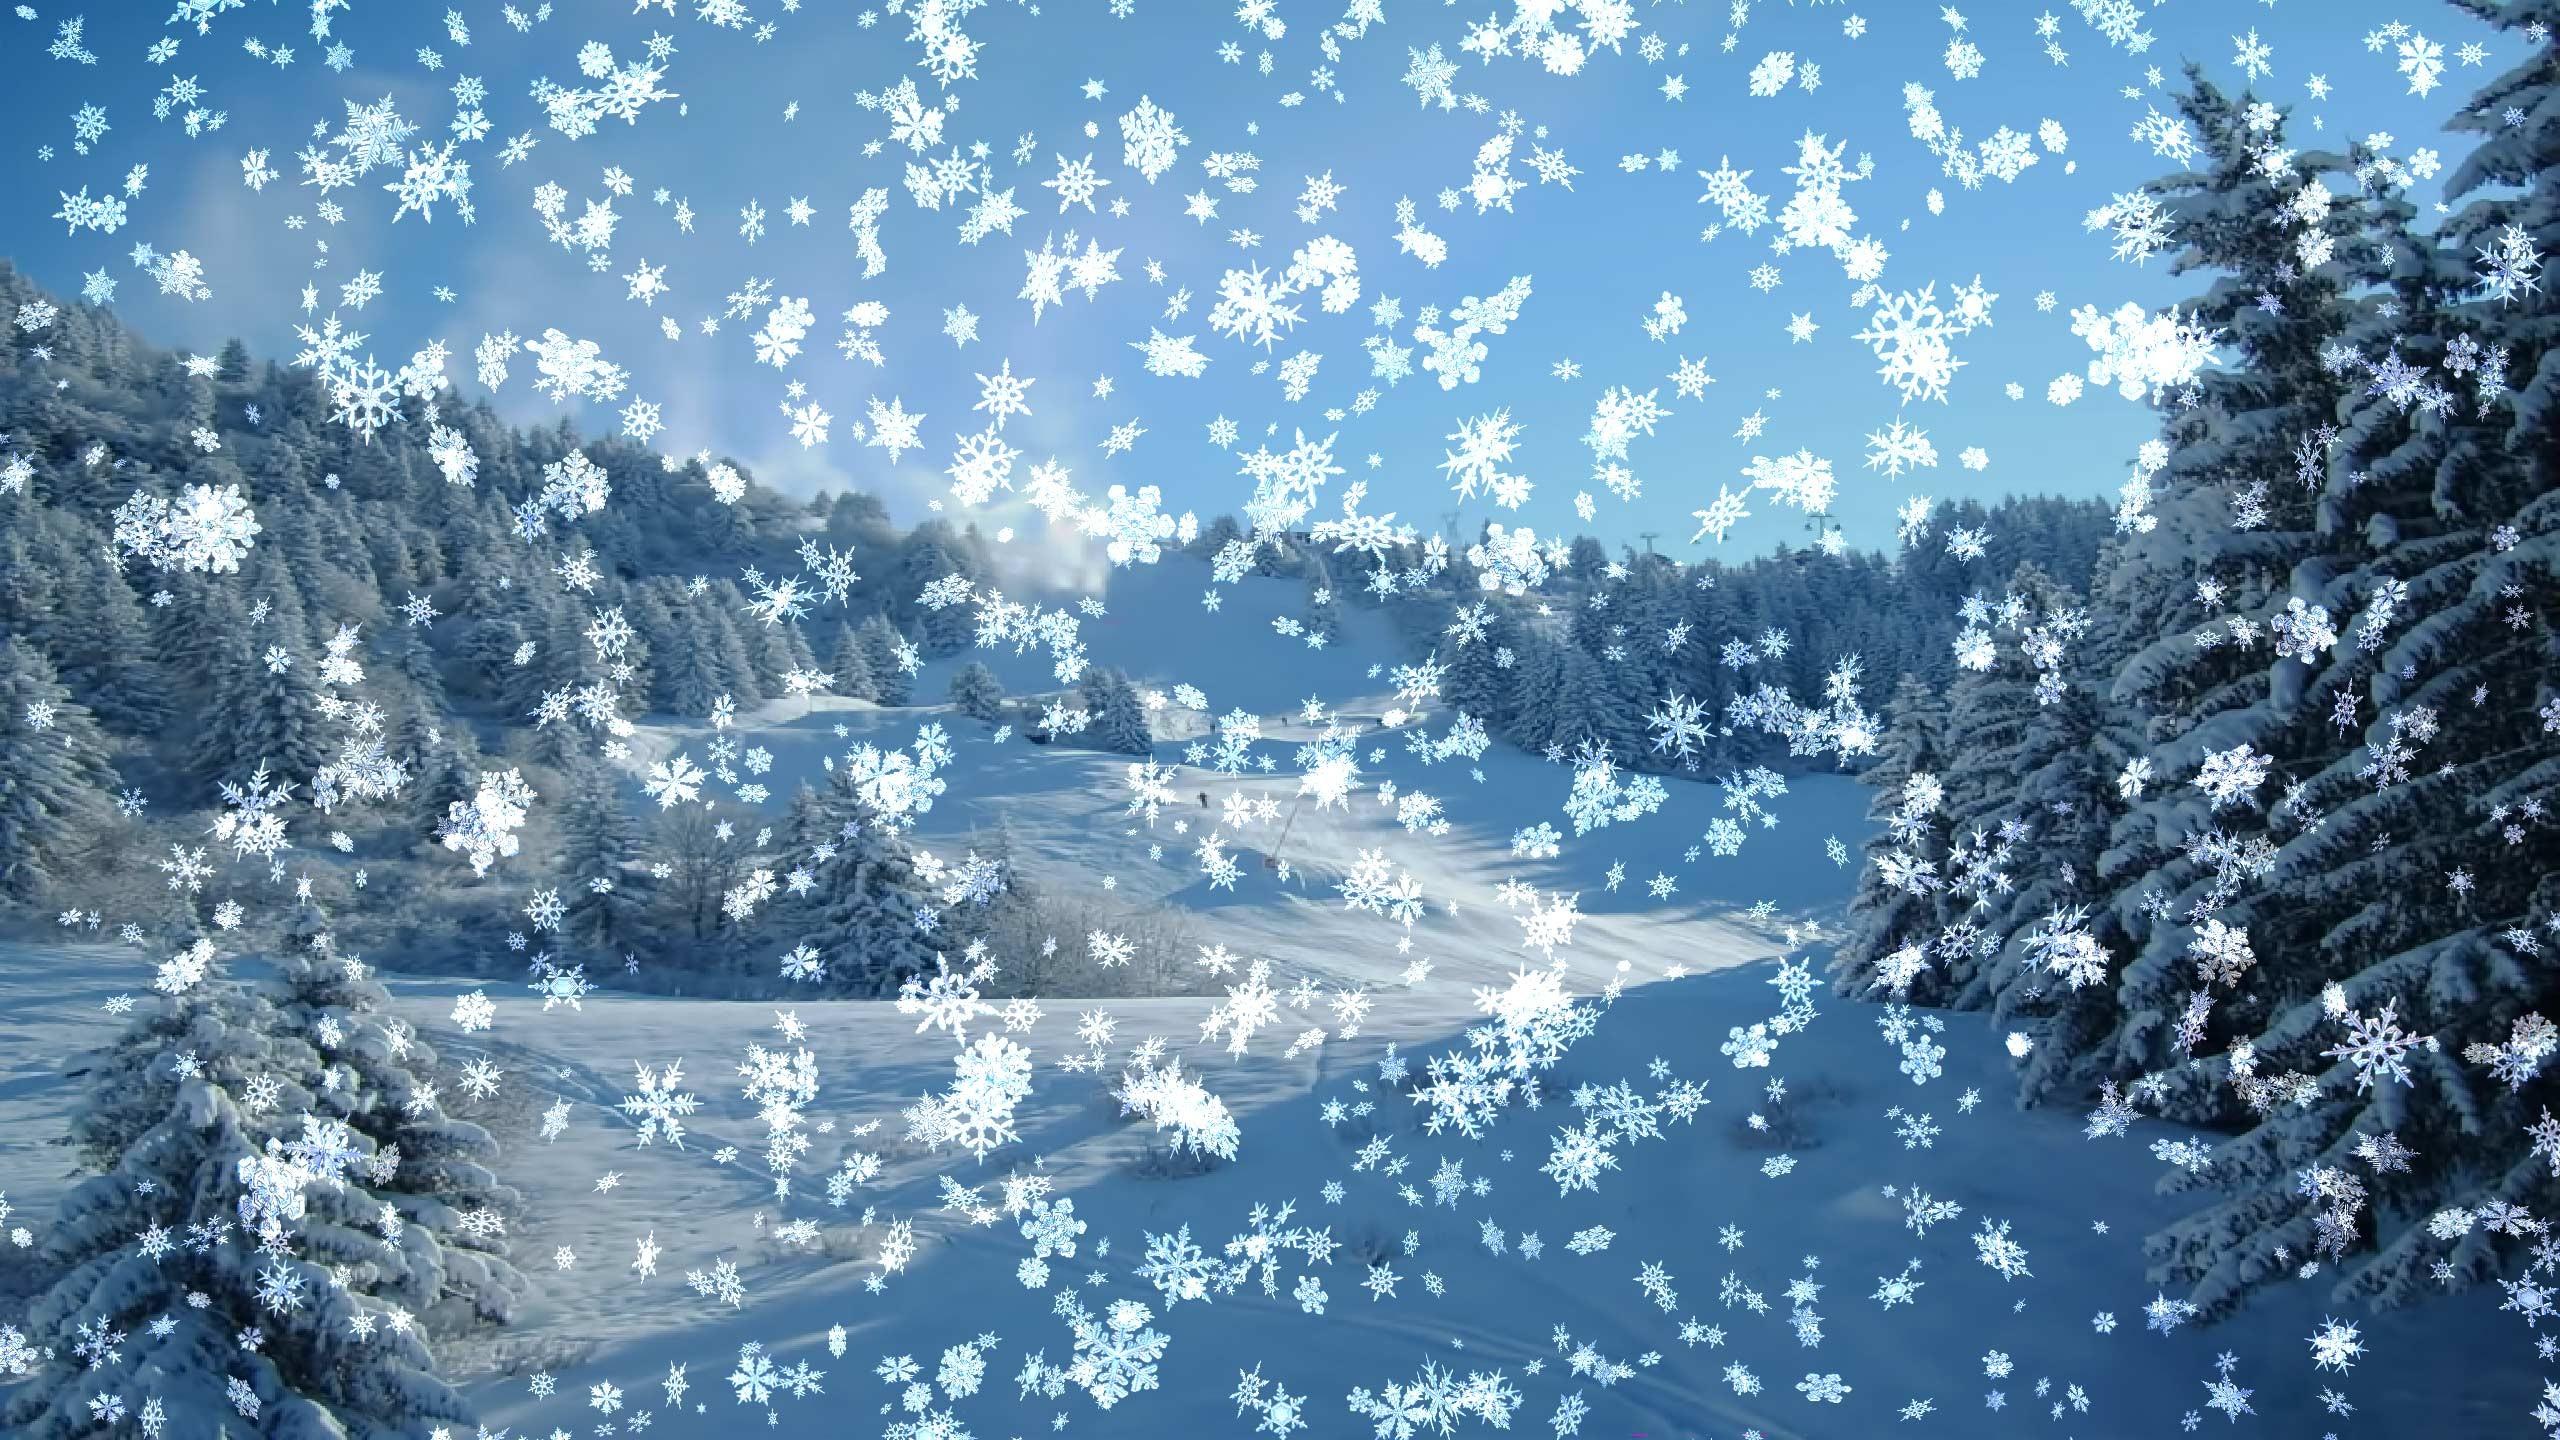 Falling Snow Live Wallpaper For Pc 3d Animated Desktop Wallpaper 39 Images